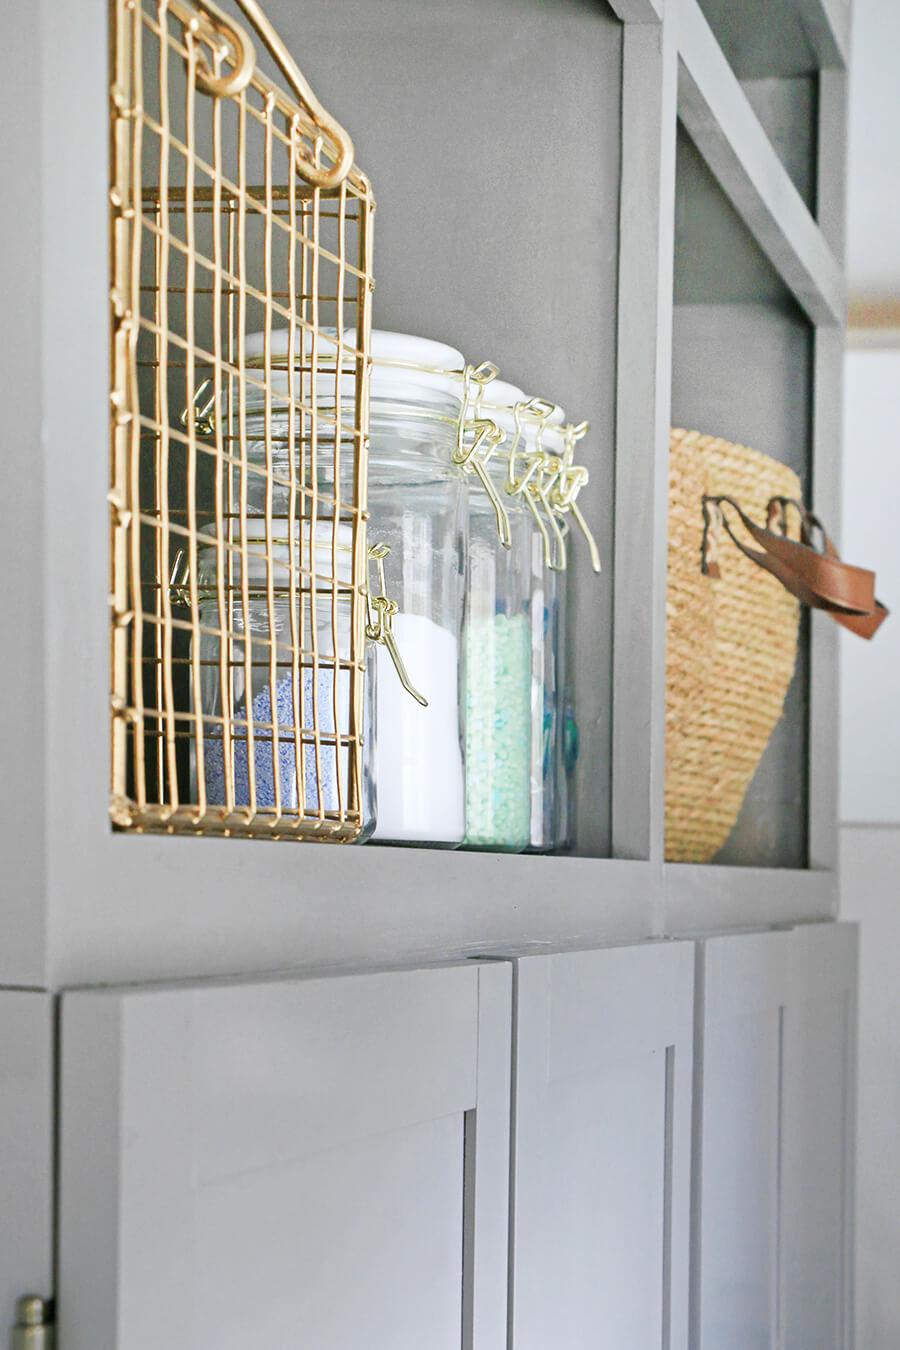 Stylish-storage-jars